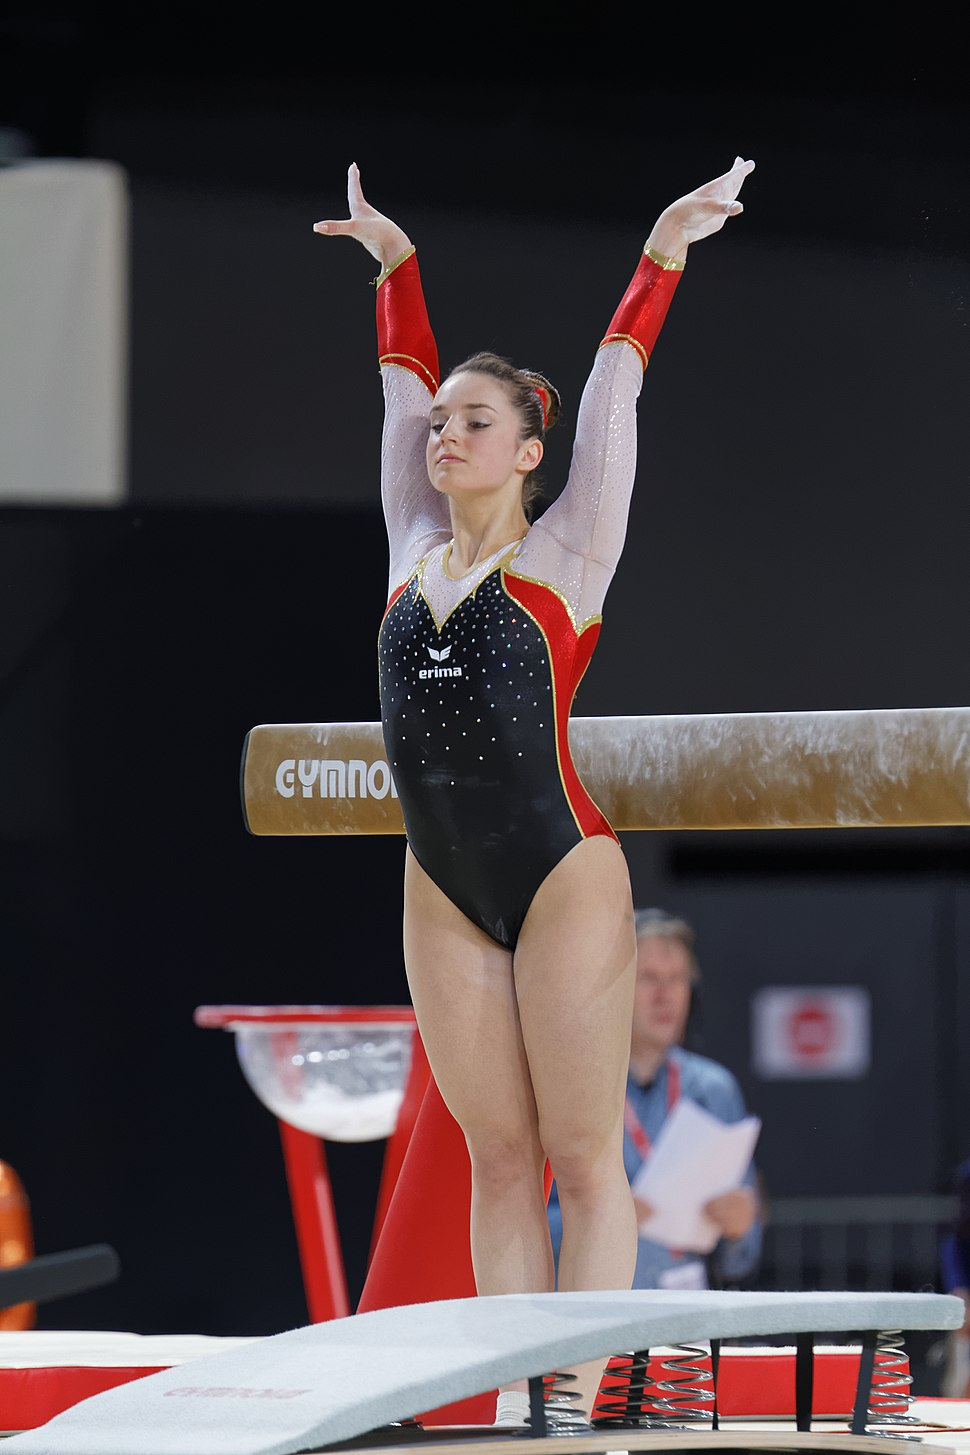 2015 European Artistic Gymnastics Championships - Balance beam - Pauline Schaefer 04